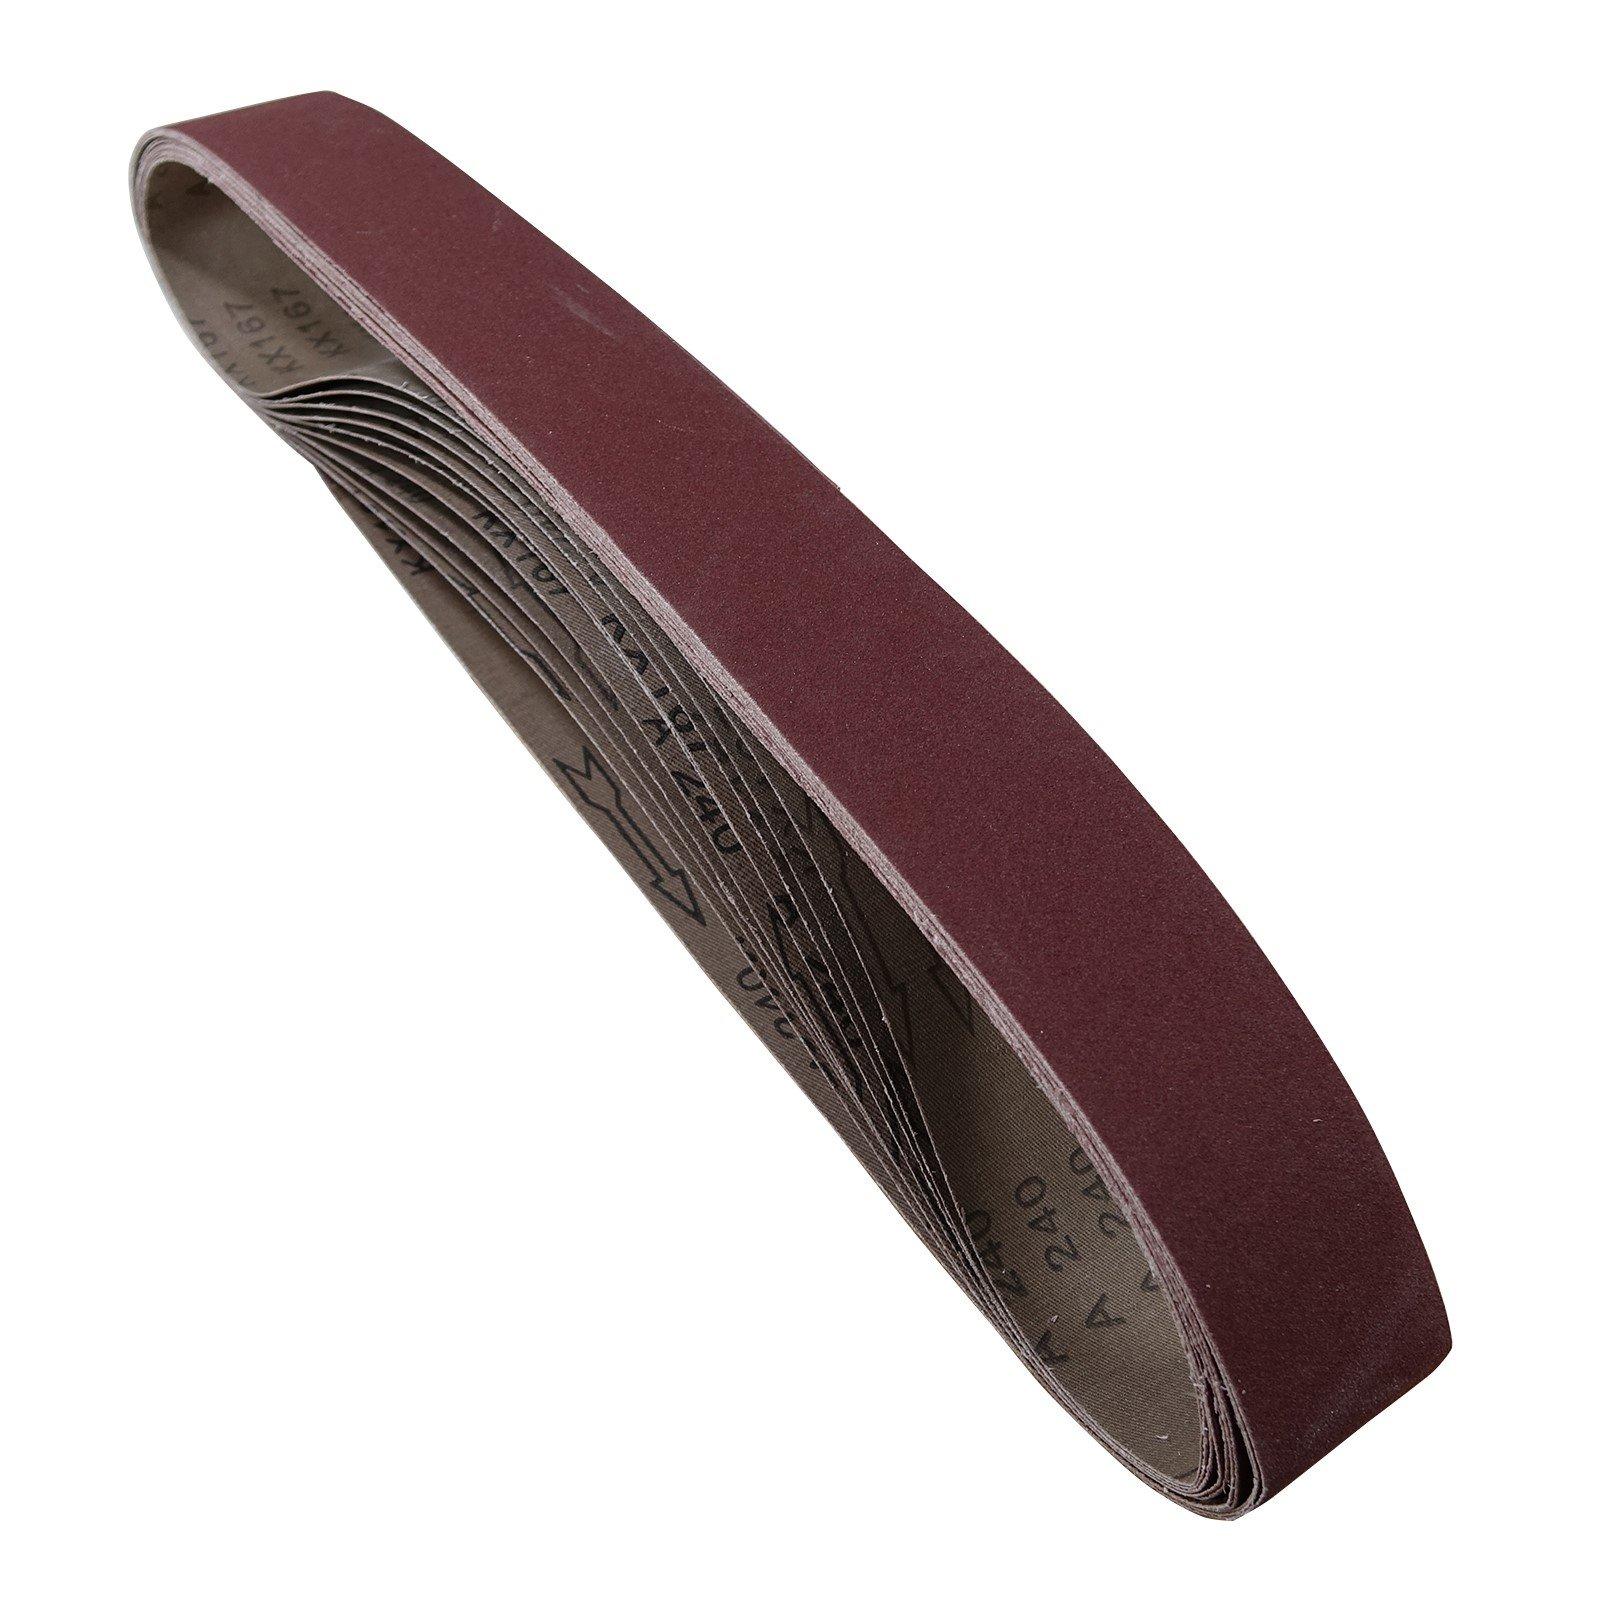 POWERTEC 424240A 2-Inch x 42-Inch 400 Grit Aluminum Oxide Sanding Belt, 10-Pack